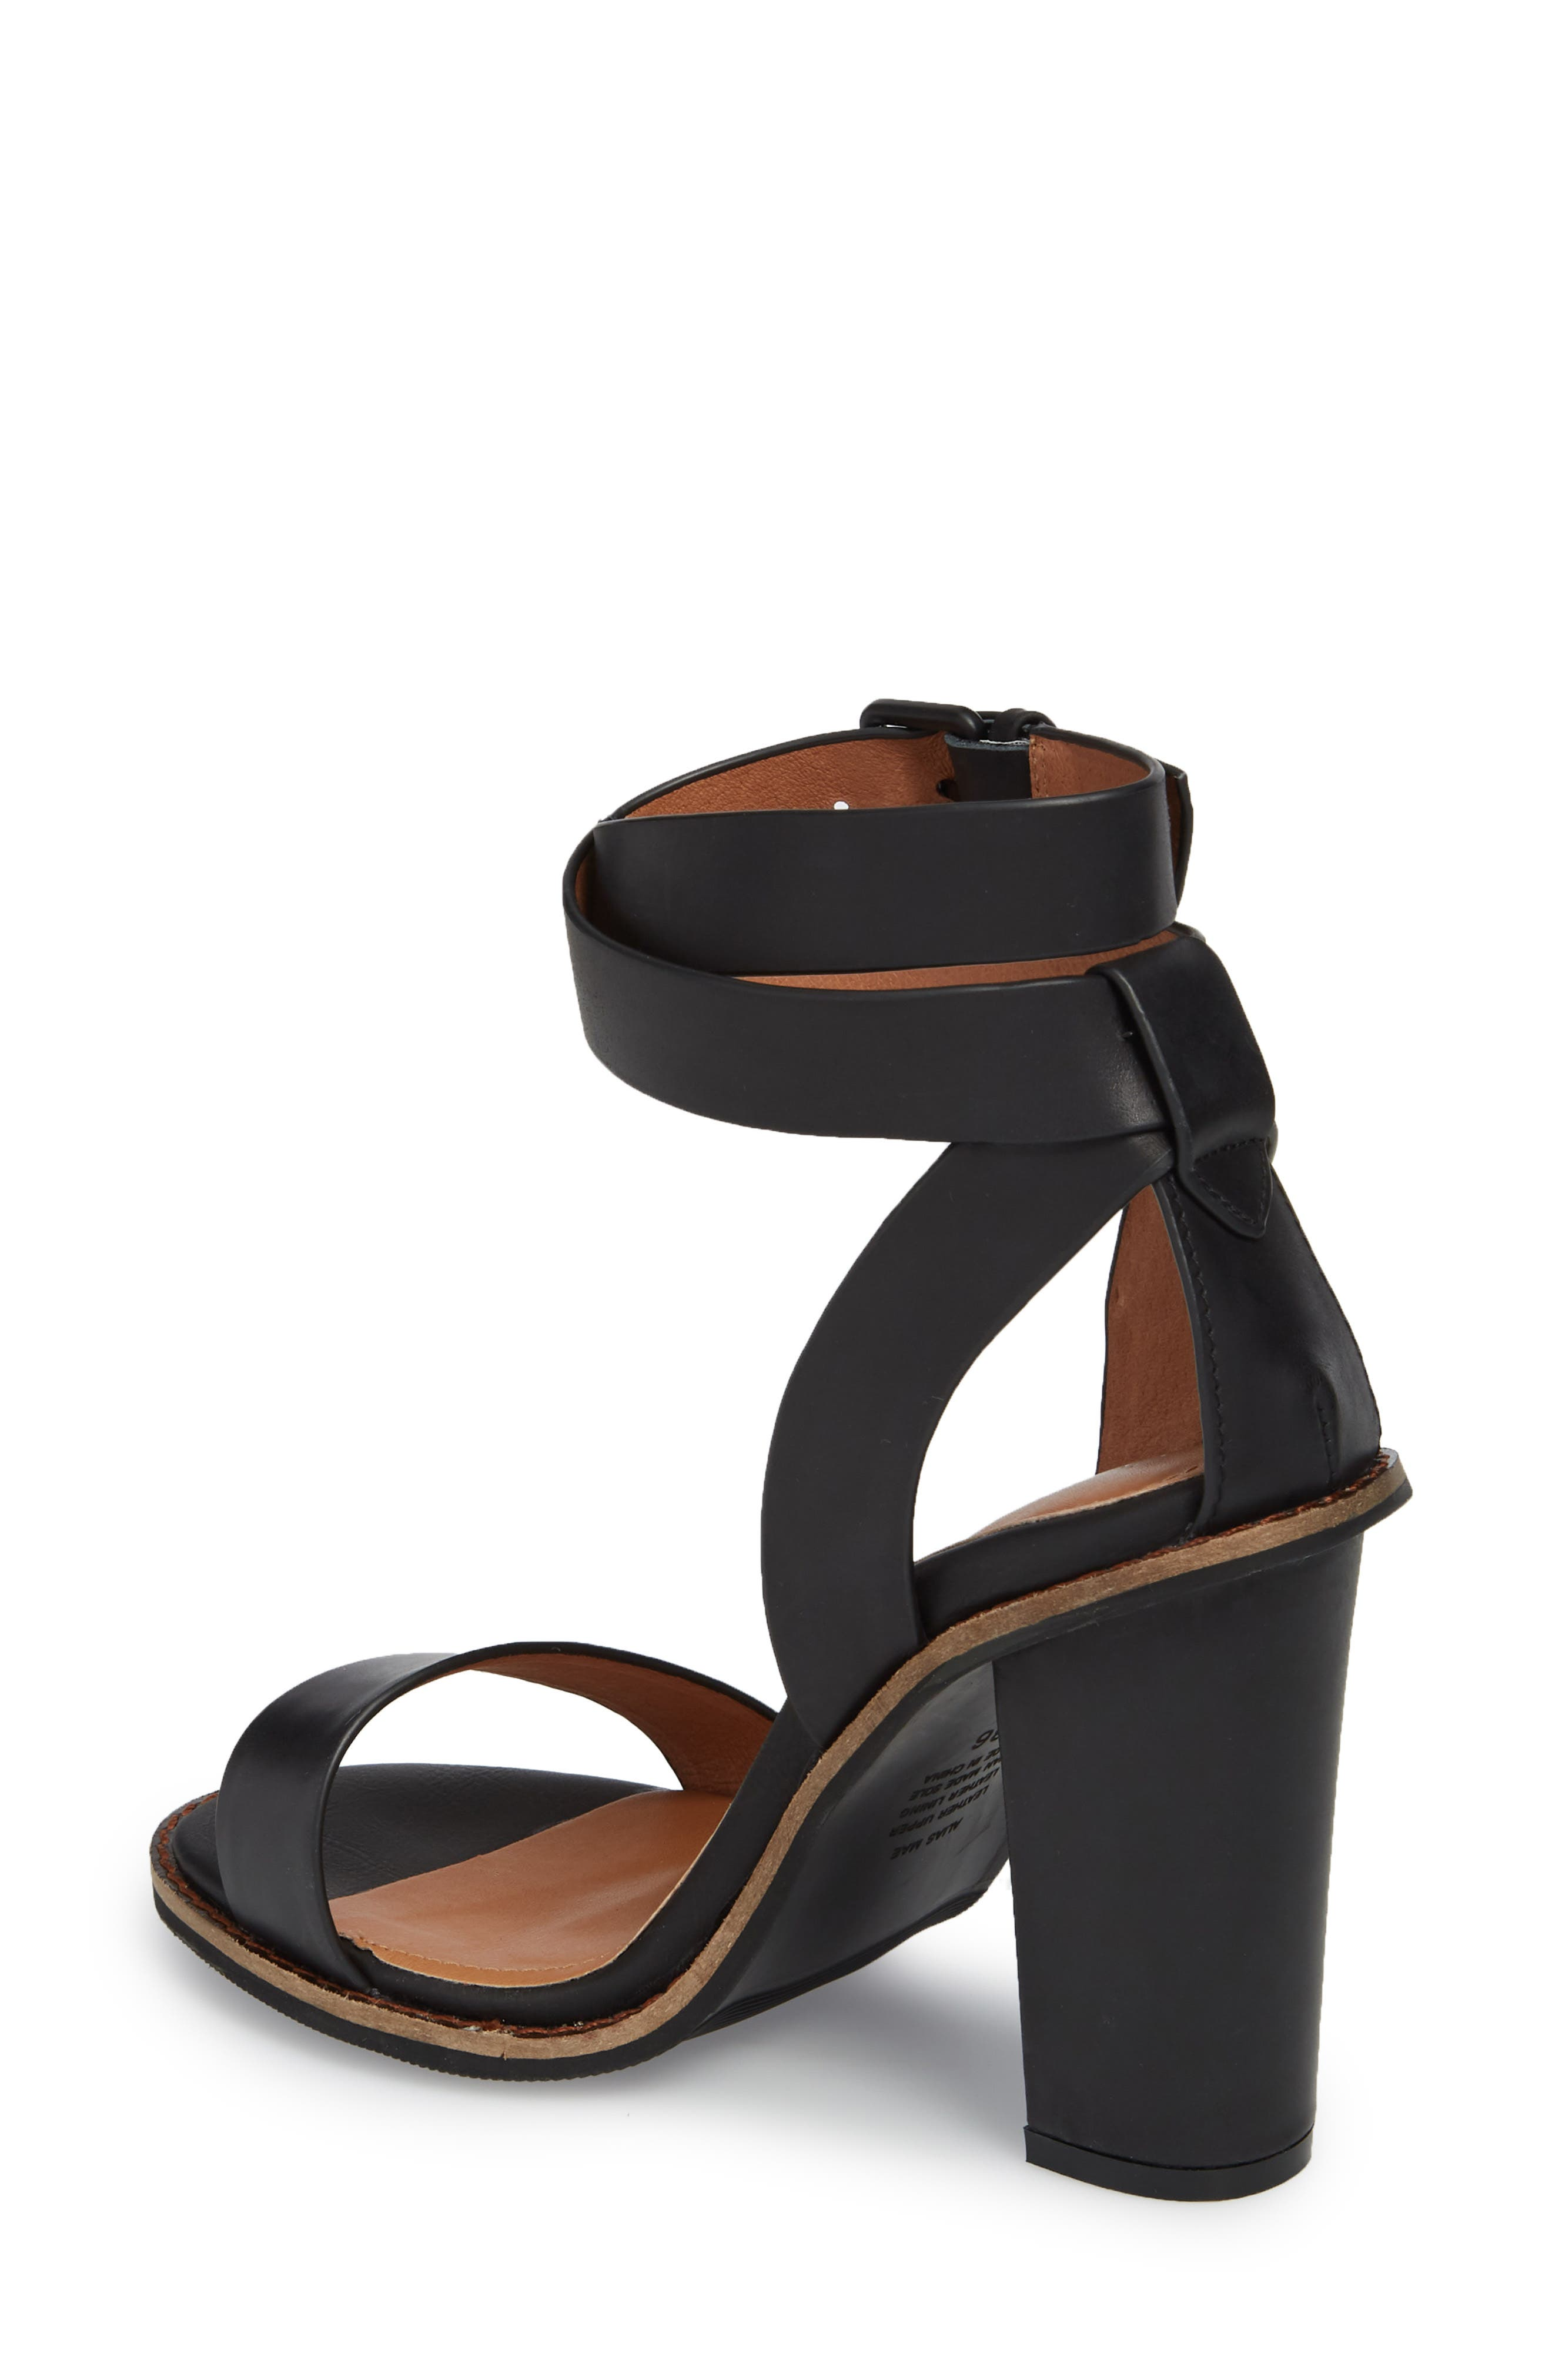 Calito Ankle Strap Sandal,                             Alternate thumbnail 3, color,